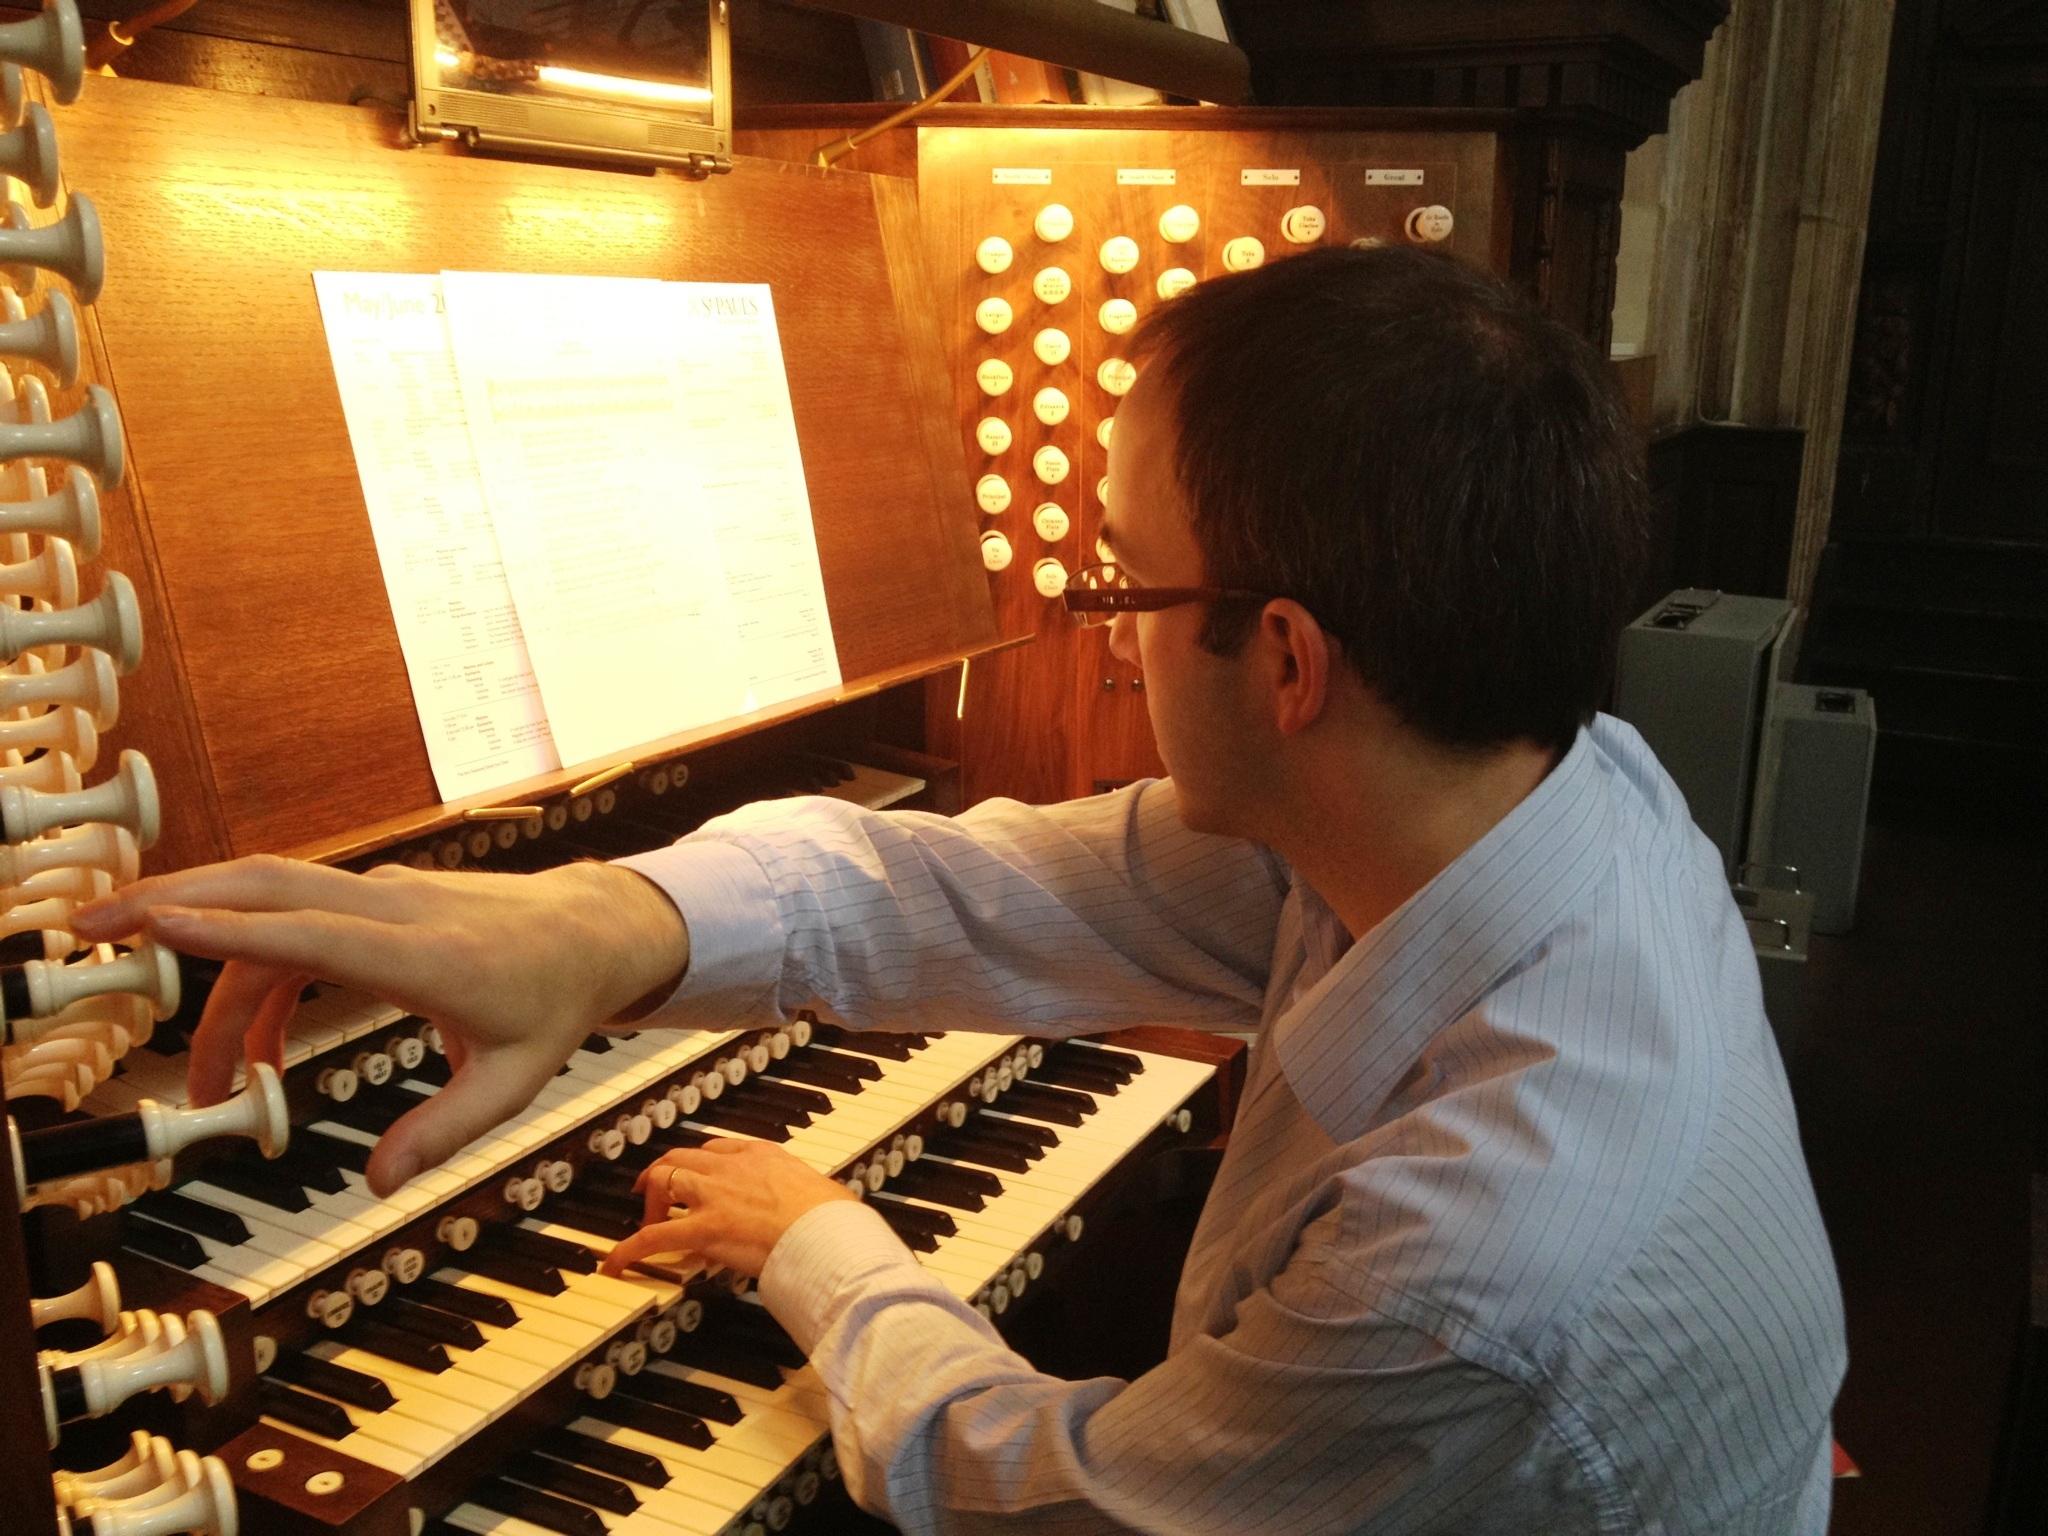 Simon_Johnson_plays_the_Grand_Organ_of_St_Paul's.JPG